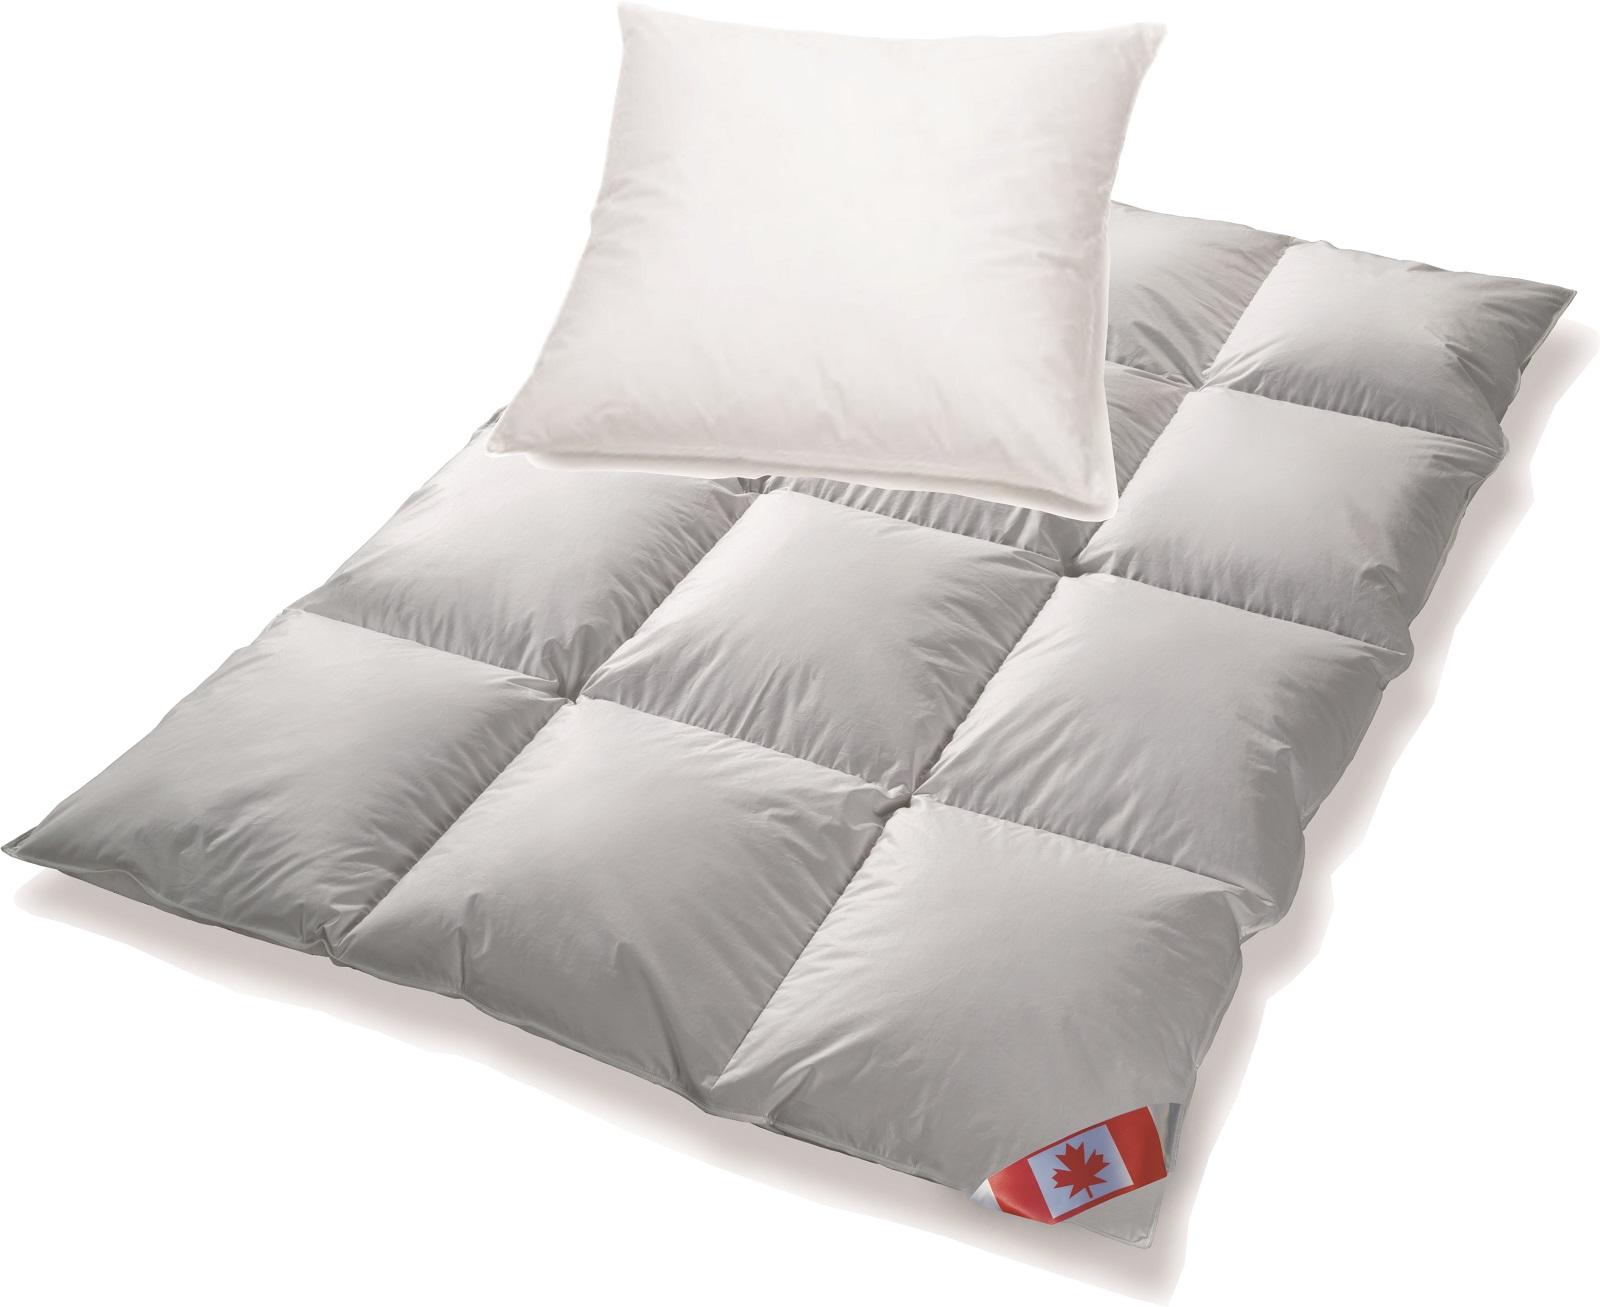 Angebot Canada Daunendecke EXTRA warm R5 100% Daune 135x200 + Kissen BASIC 80x80